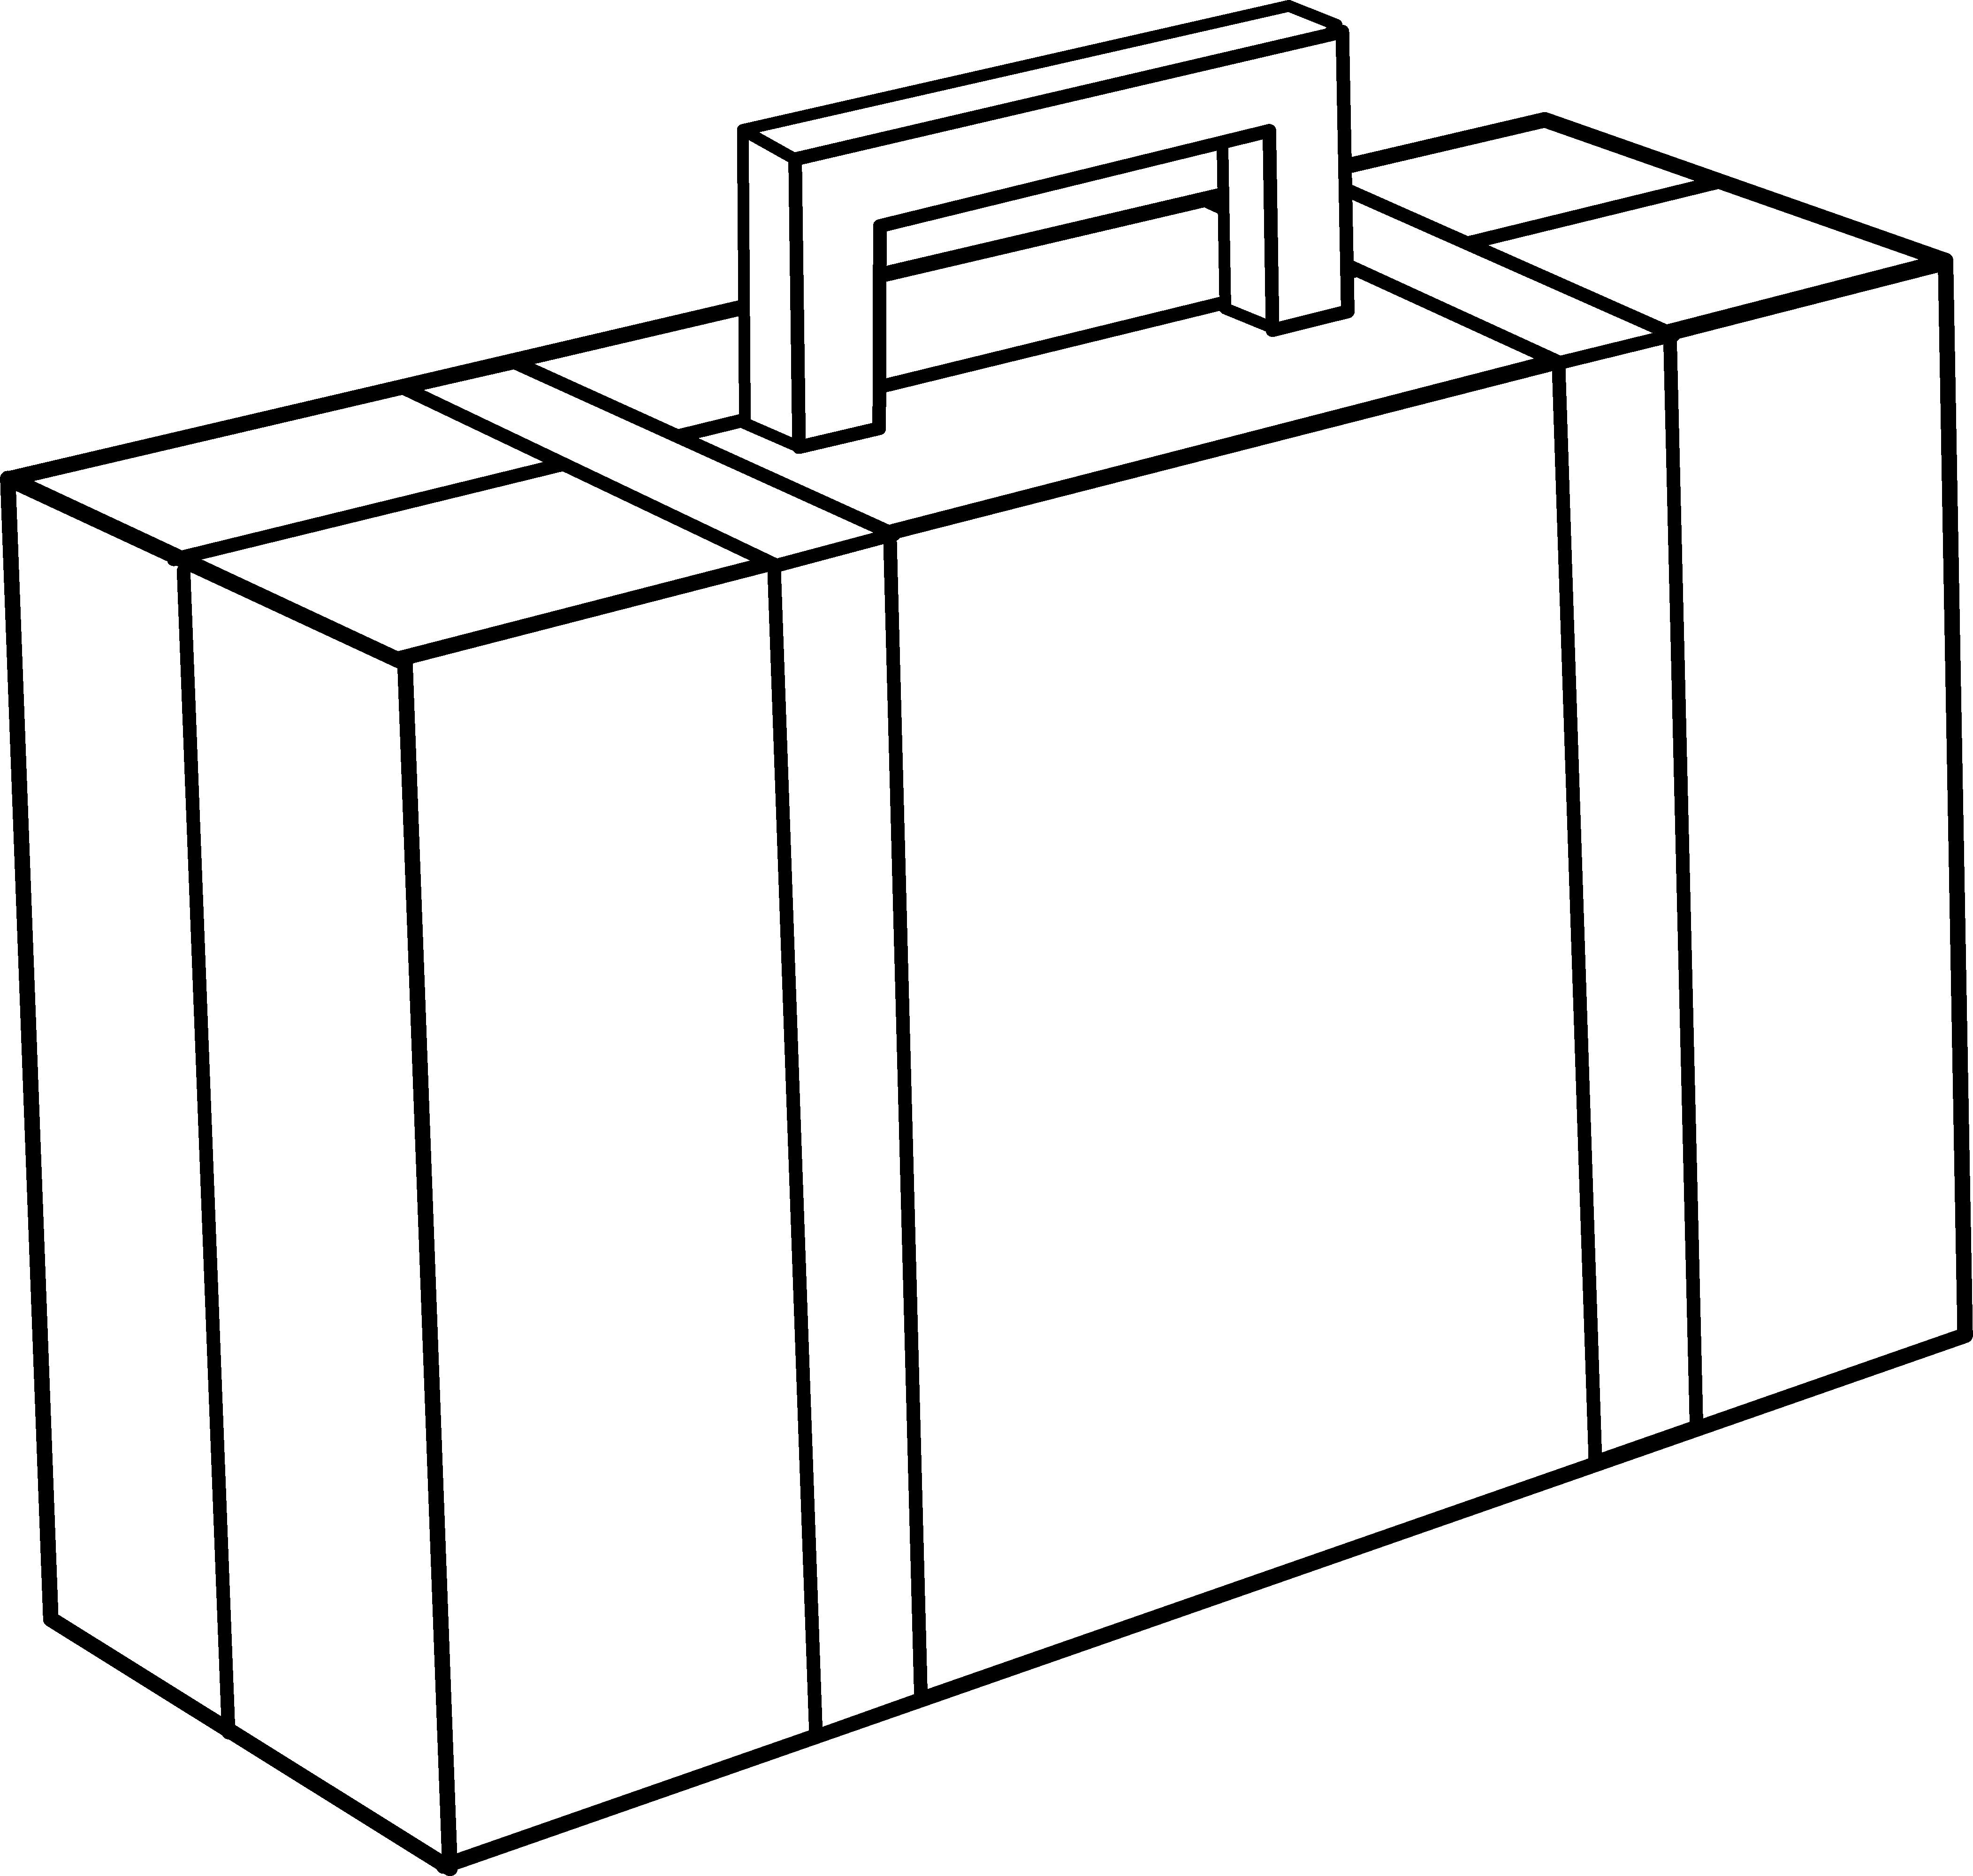 Briefcase line art free. Gate clipart metallic